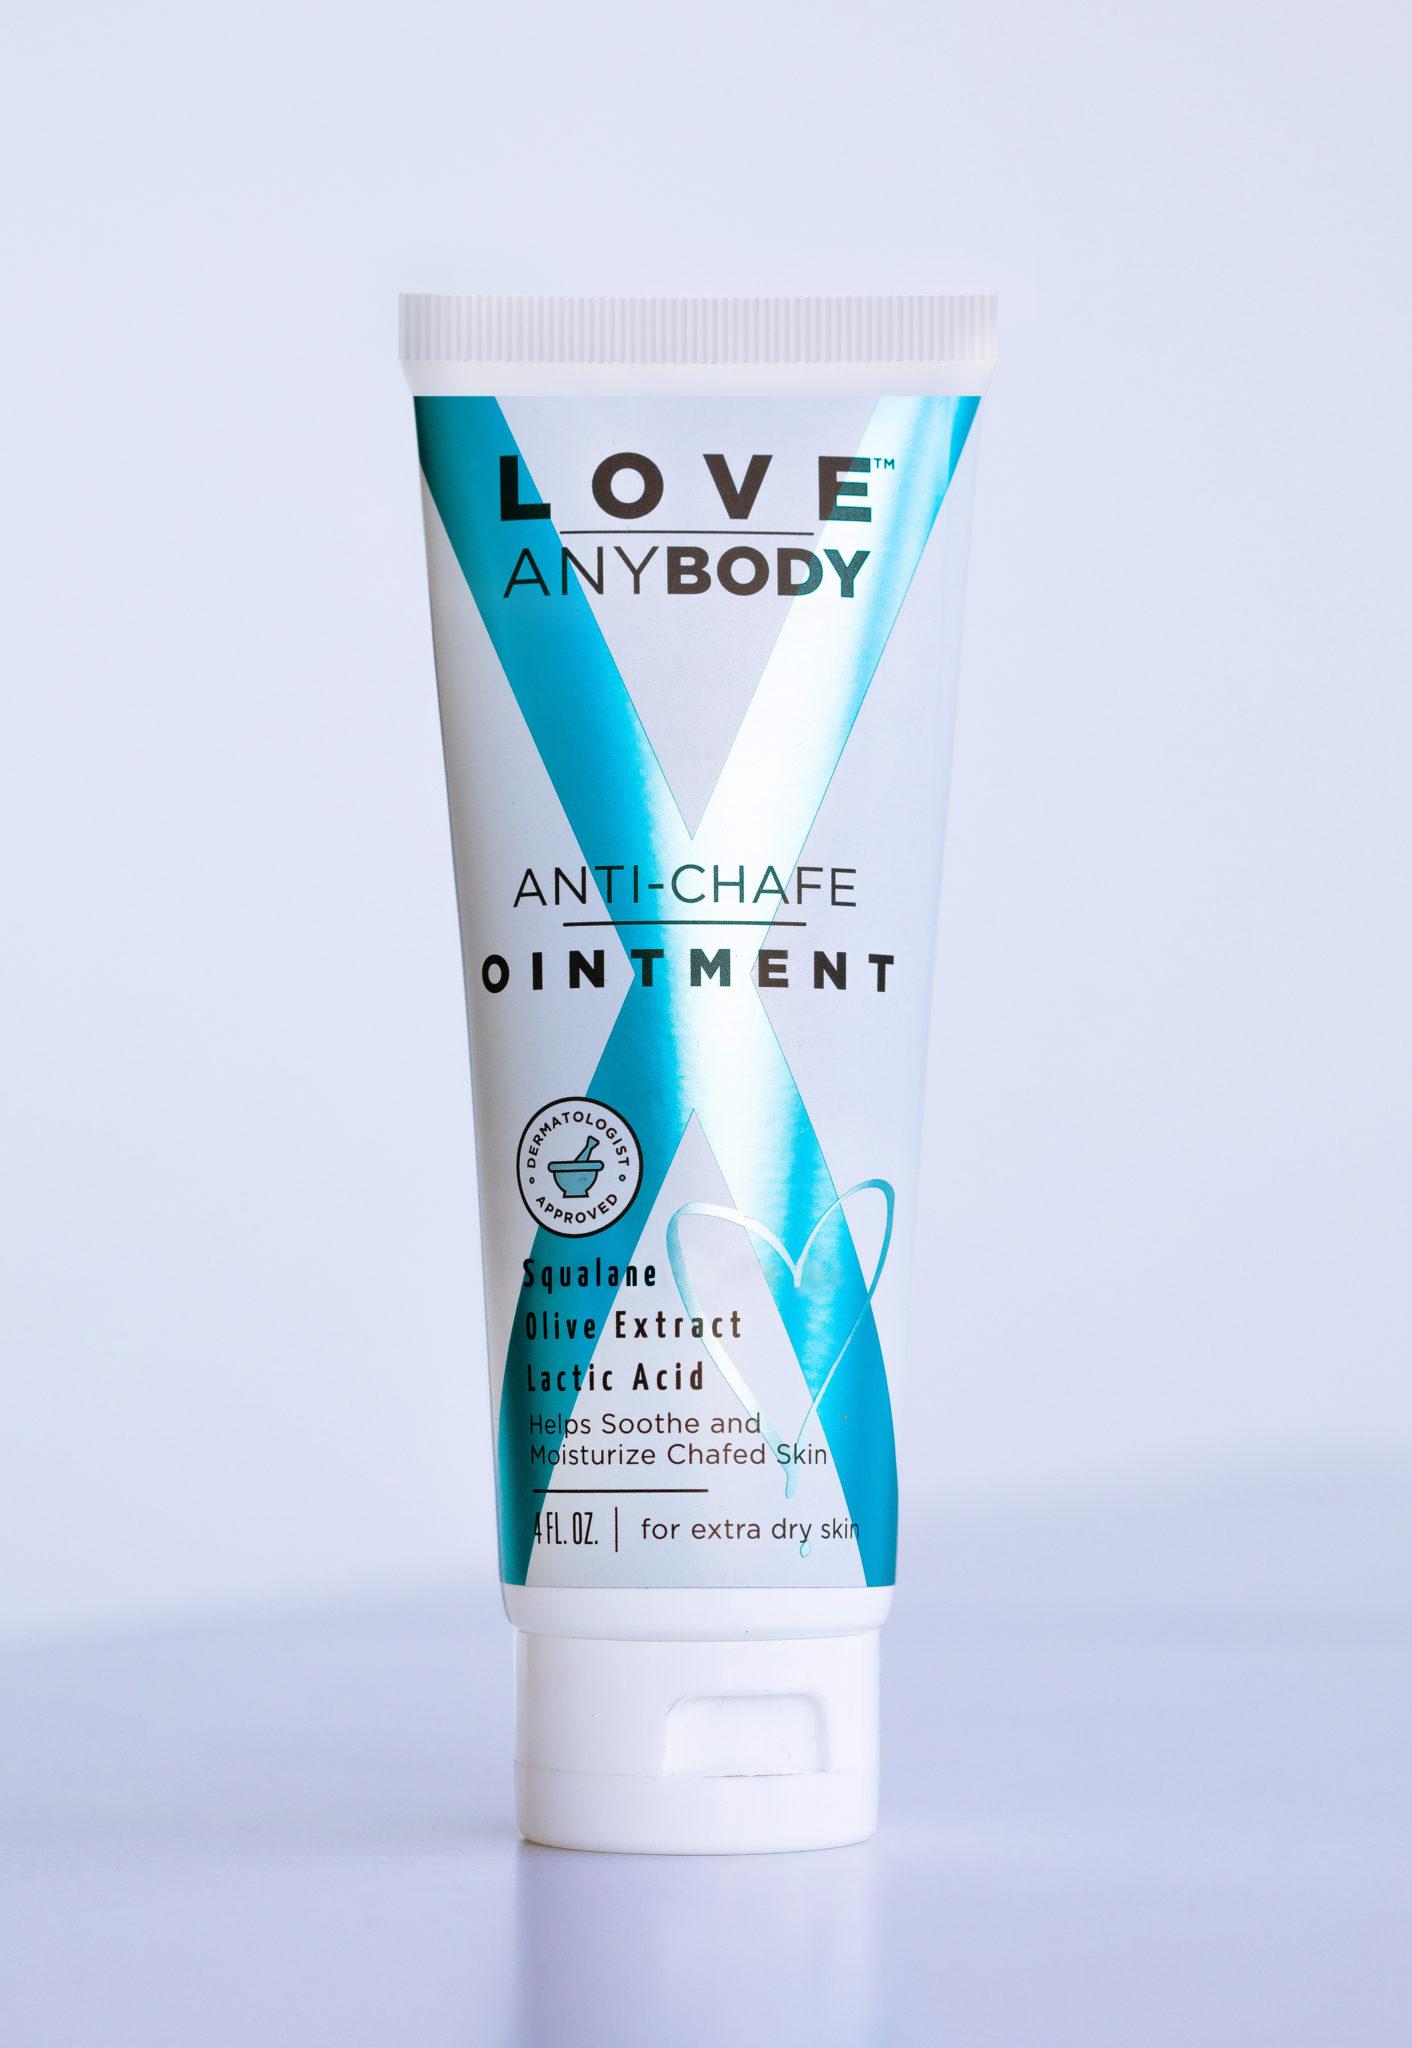 Love AnyBody Anti-Chafe Ointment multitasking beauty